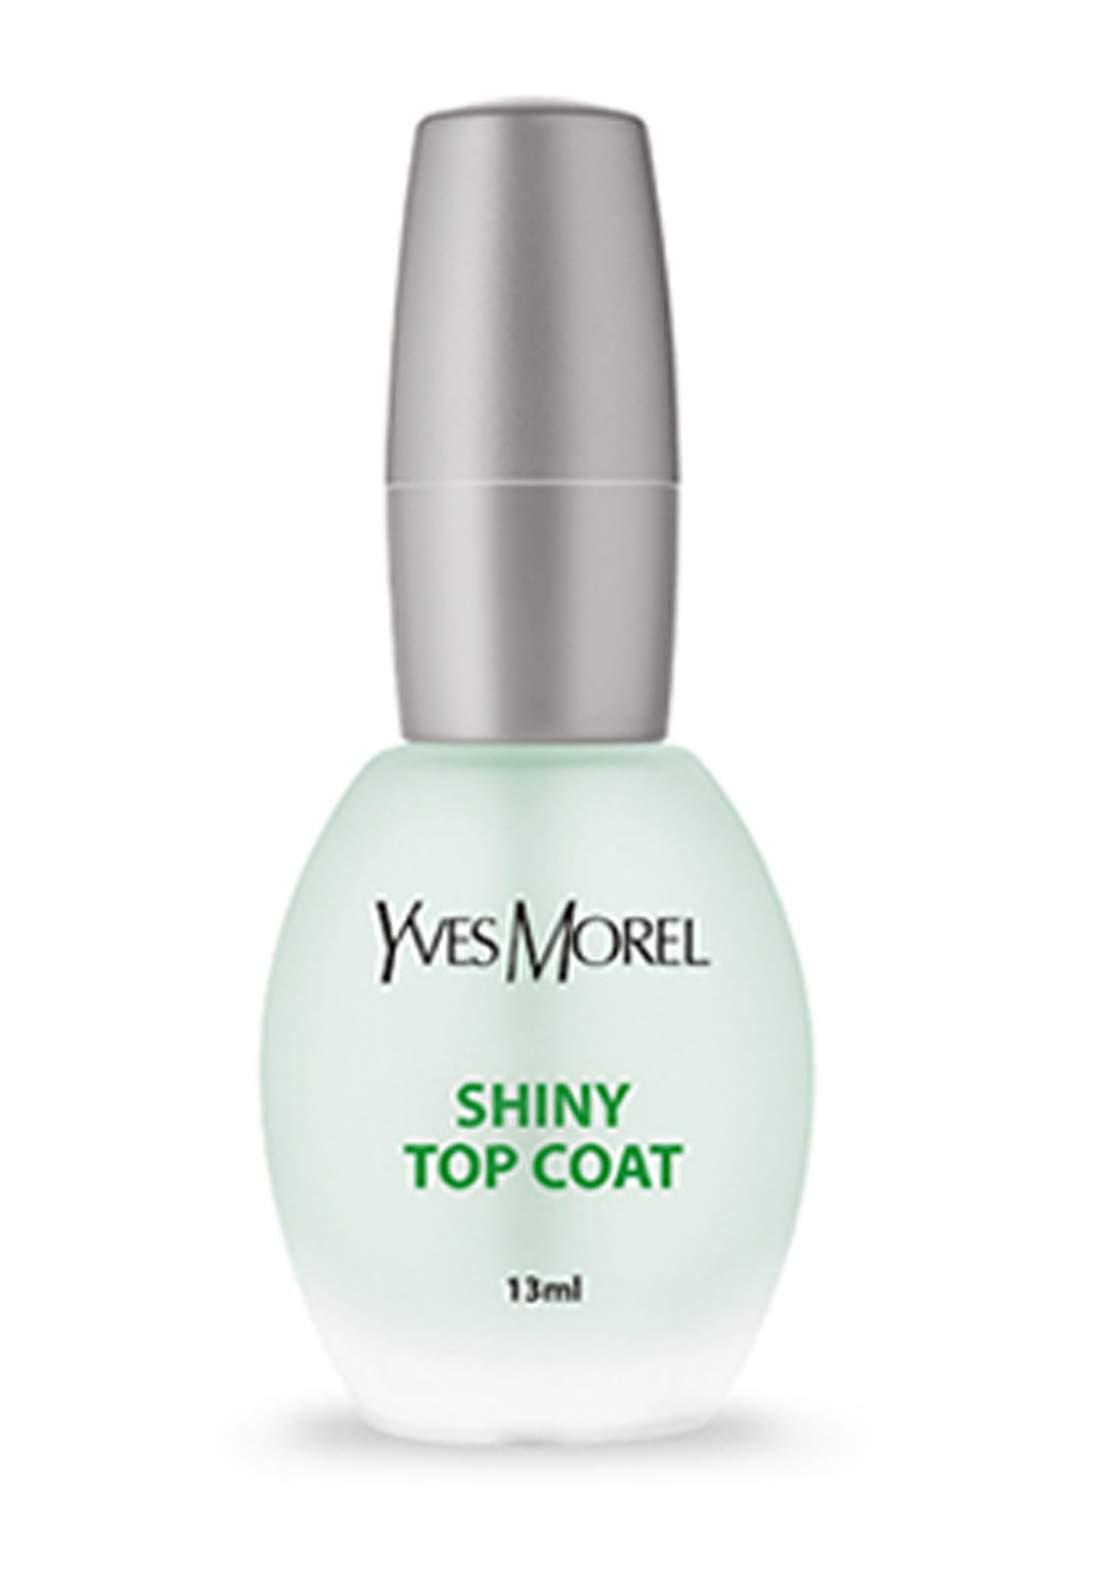 Yves Morel Nails Shiny Top Coat Protection 13ml مقوي اظافر